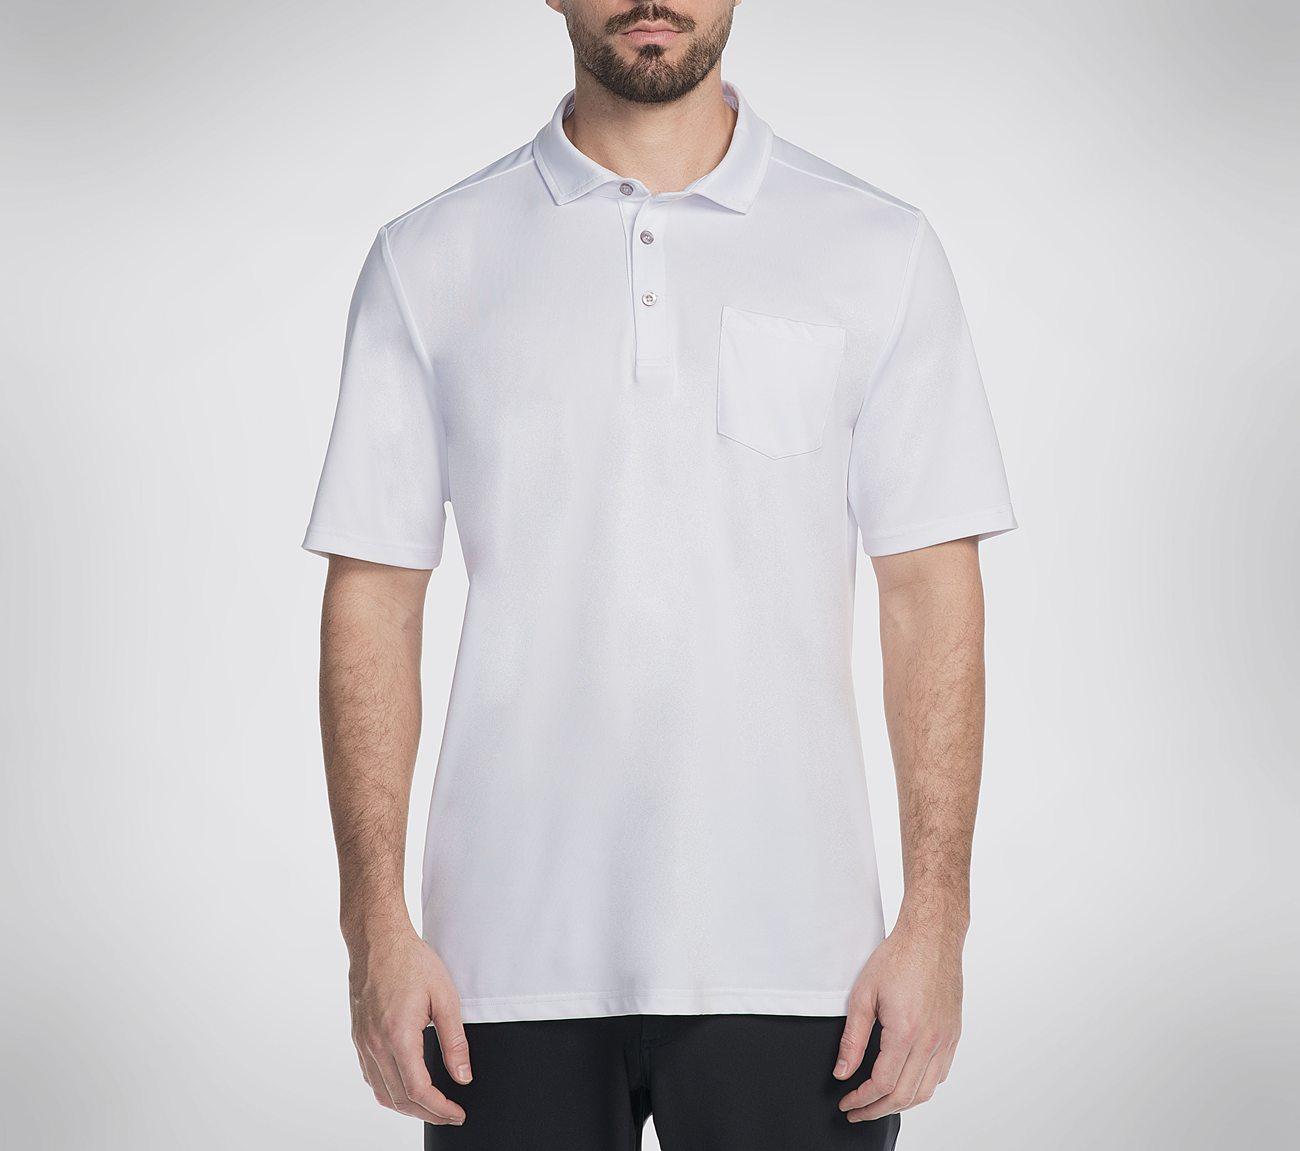 Men's Skechers GO GOLF Sawgrass Pocket Polo Shirt